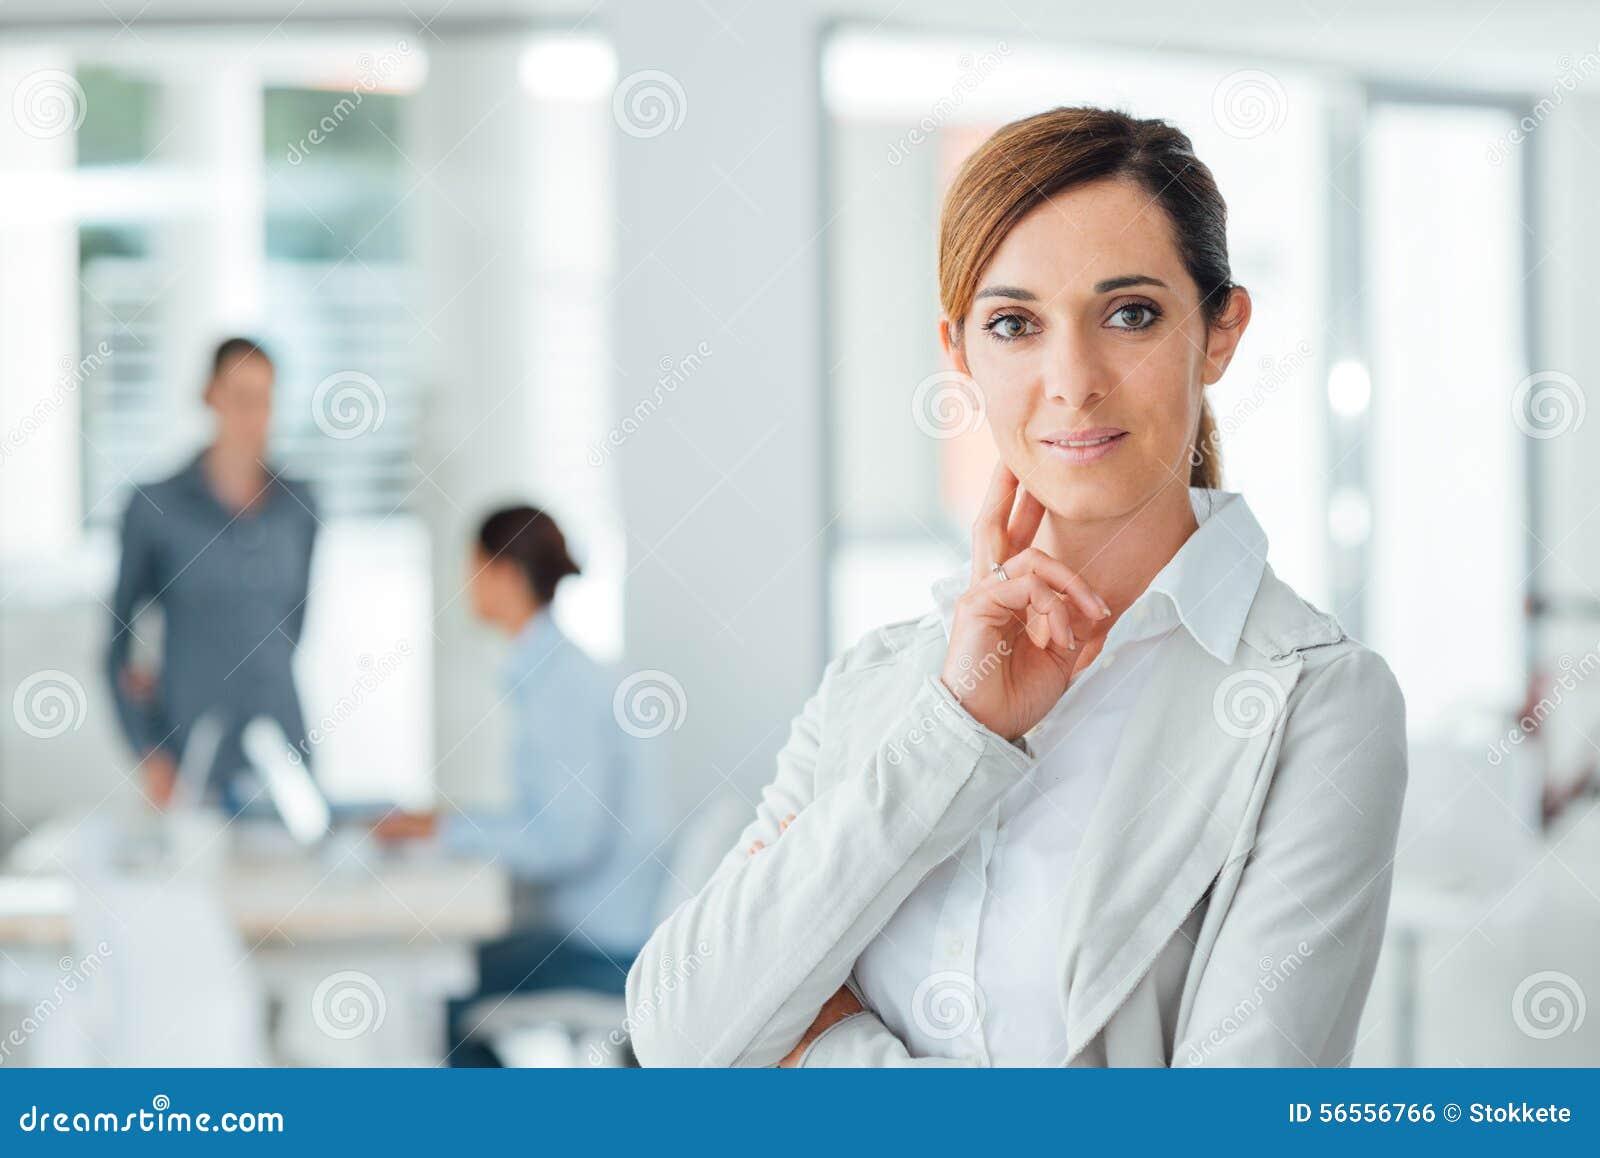 Download Βέβαια τοποθέτηση επιχειρηματιών γυναικών στο γραφείο της Στοκ Εικόνες - εικόνα από τοποθέτηση, τοποθέτησης: 56556766